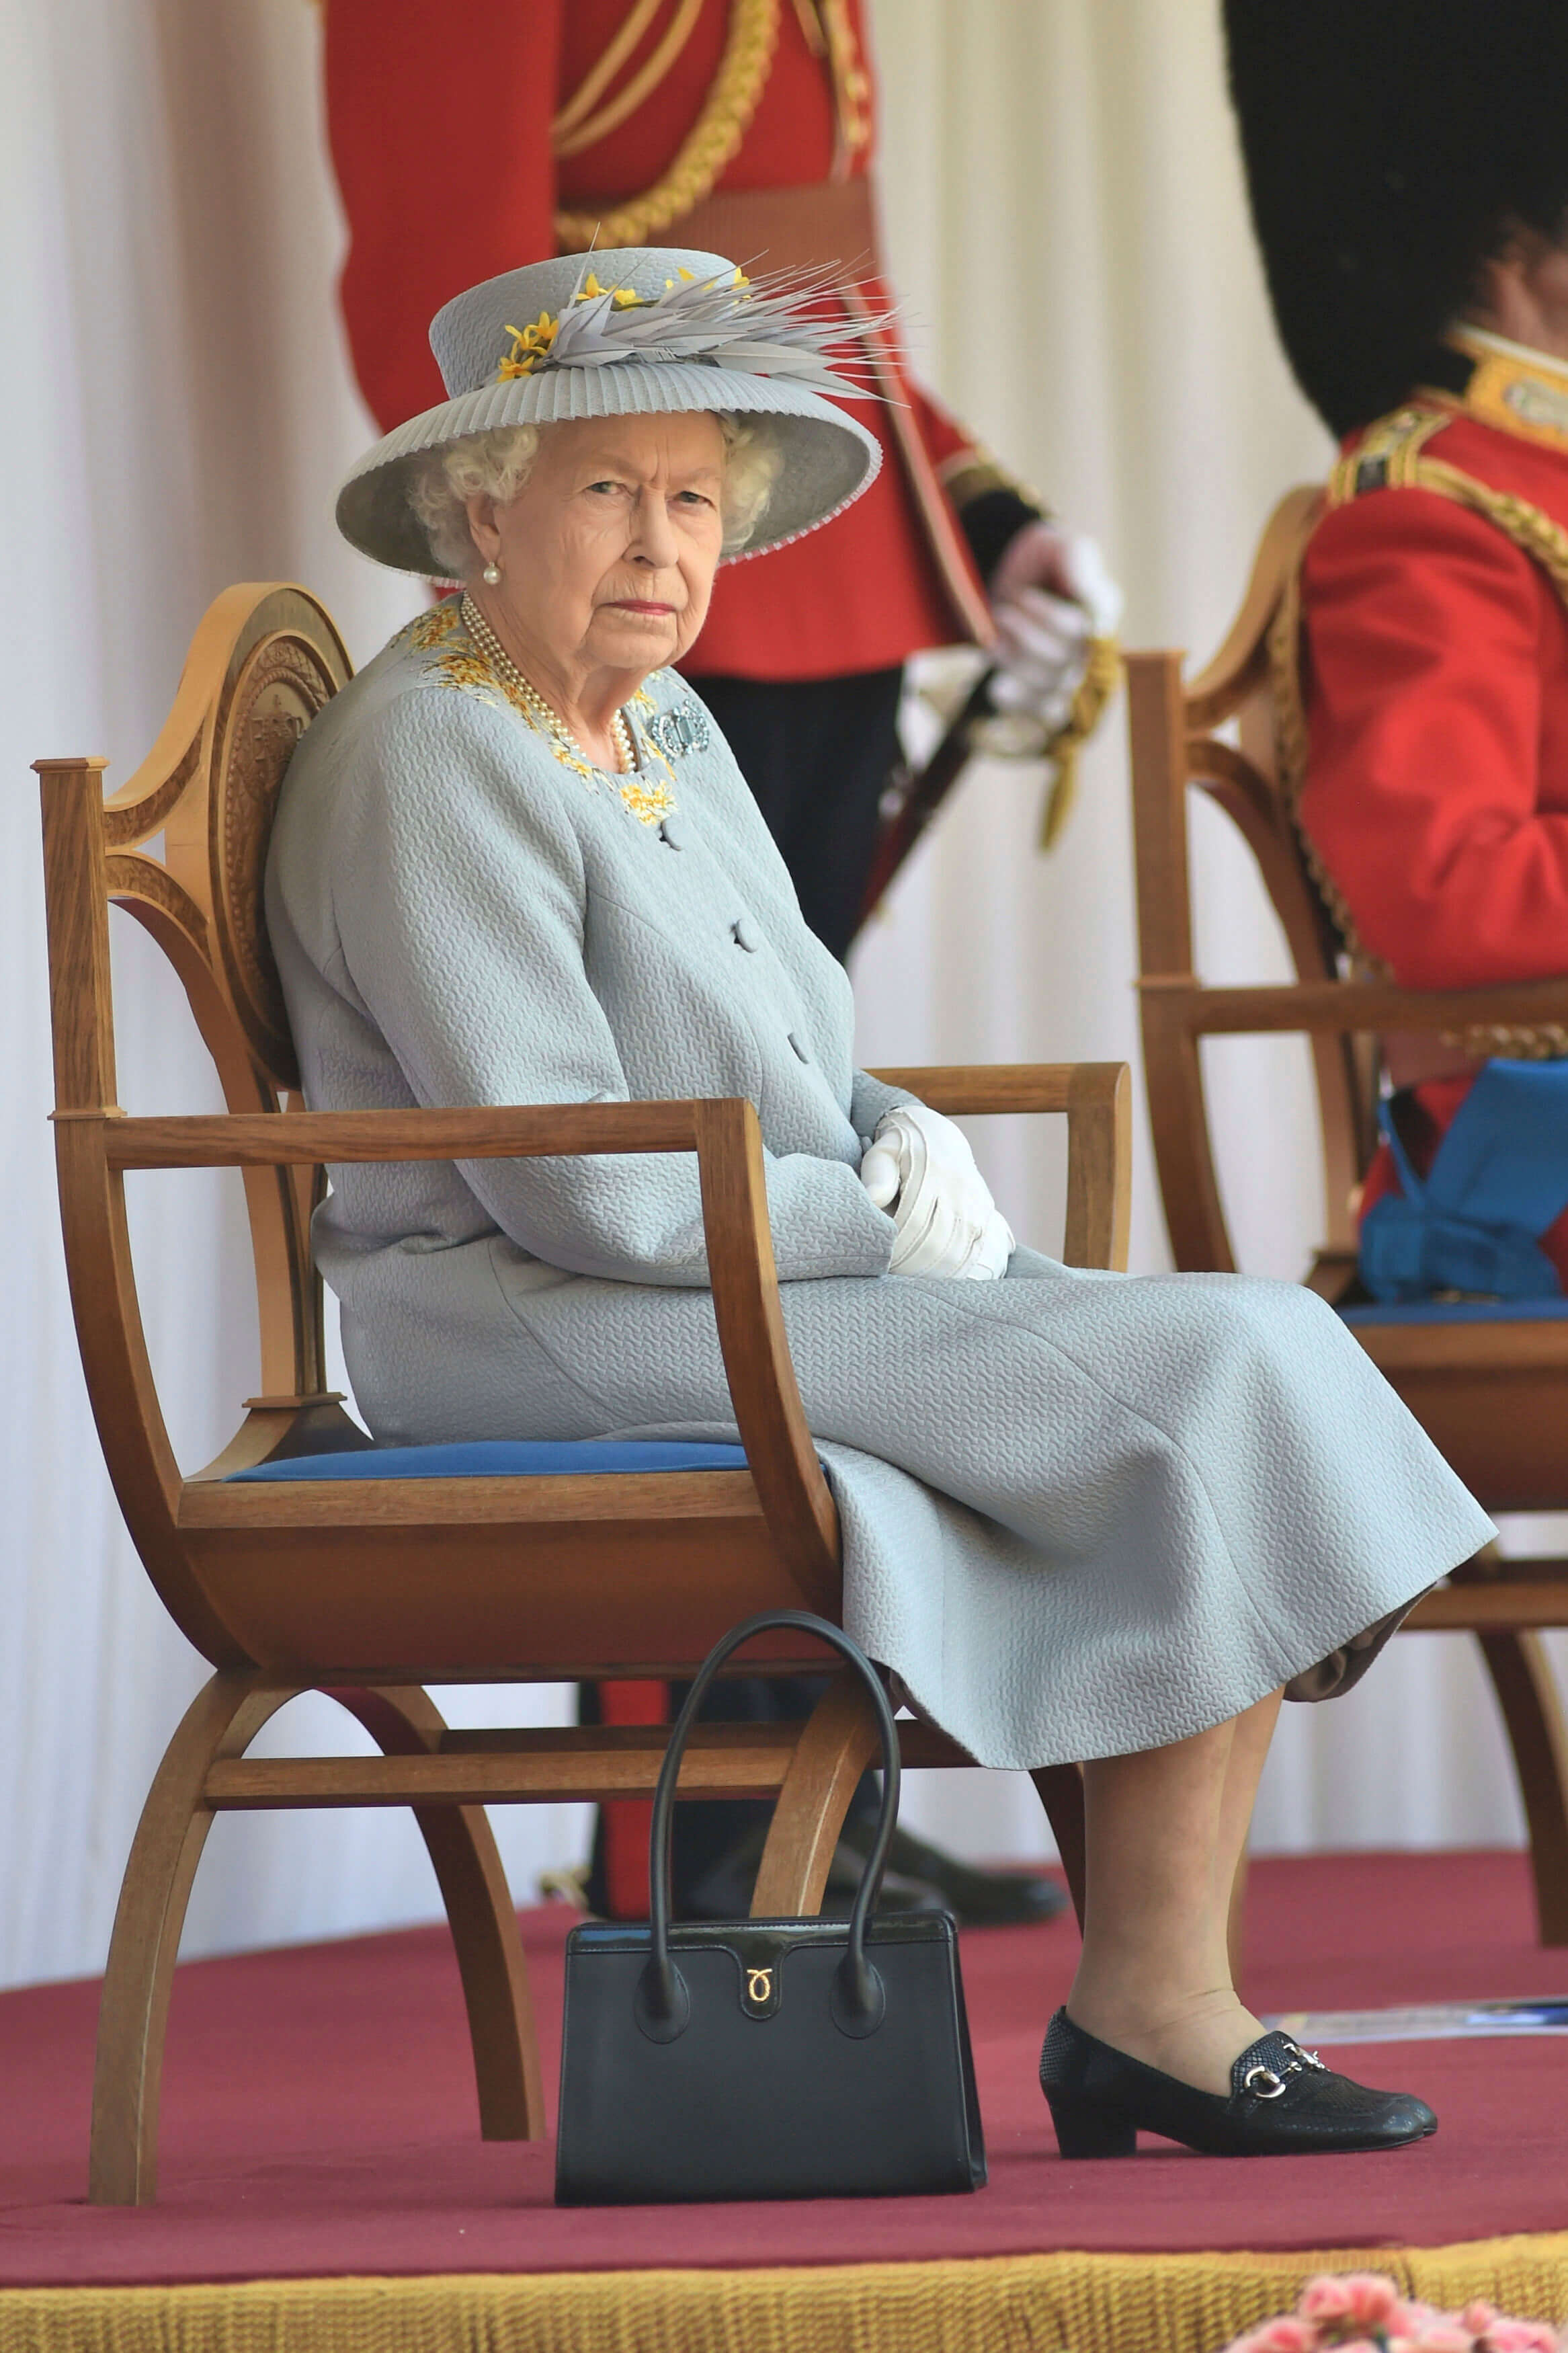 Queen Elizabeth Trooping the Color